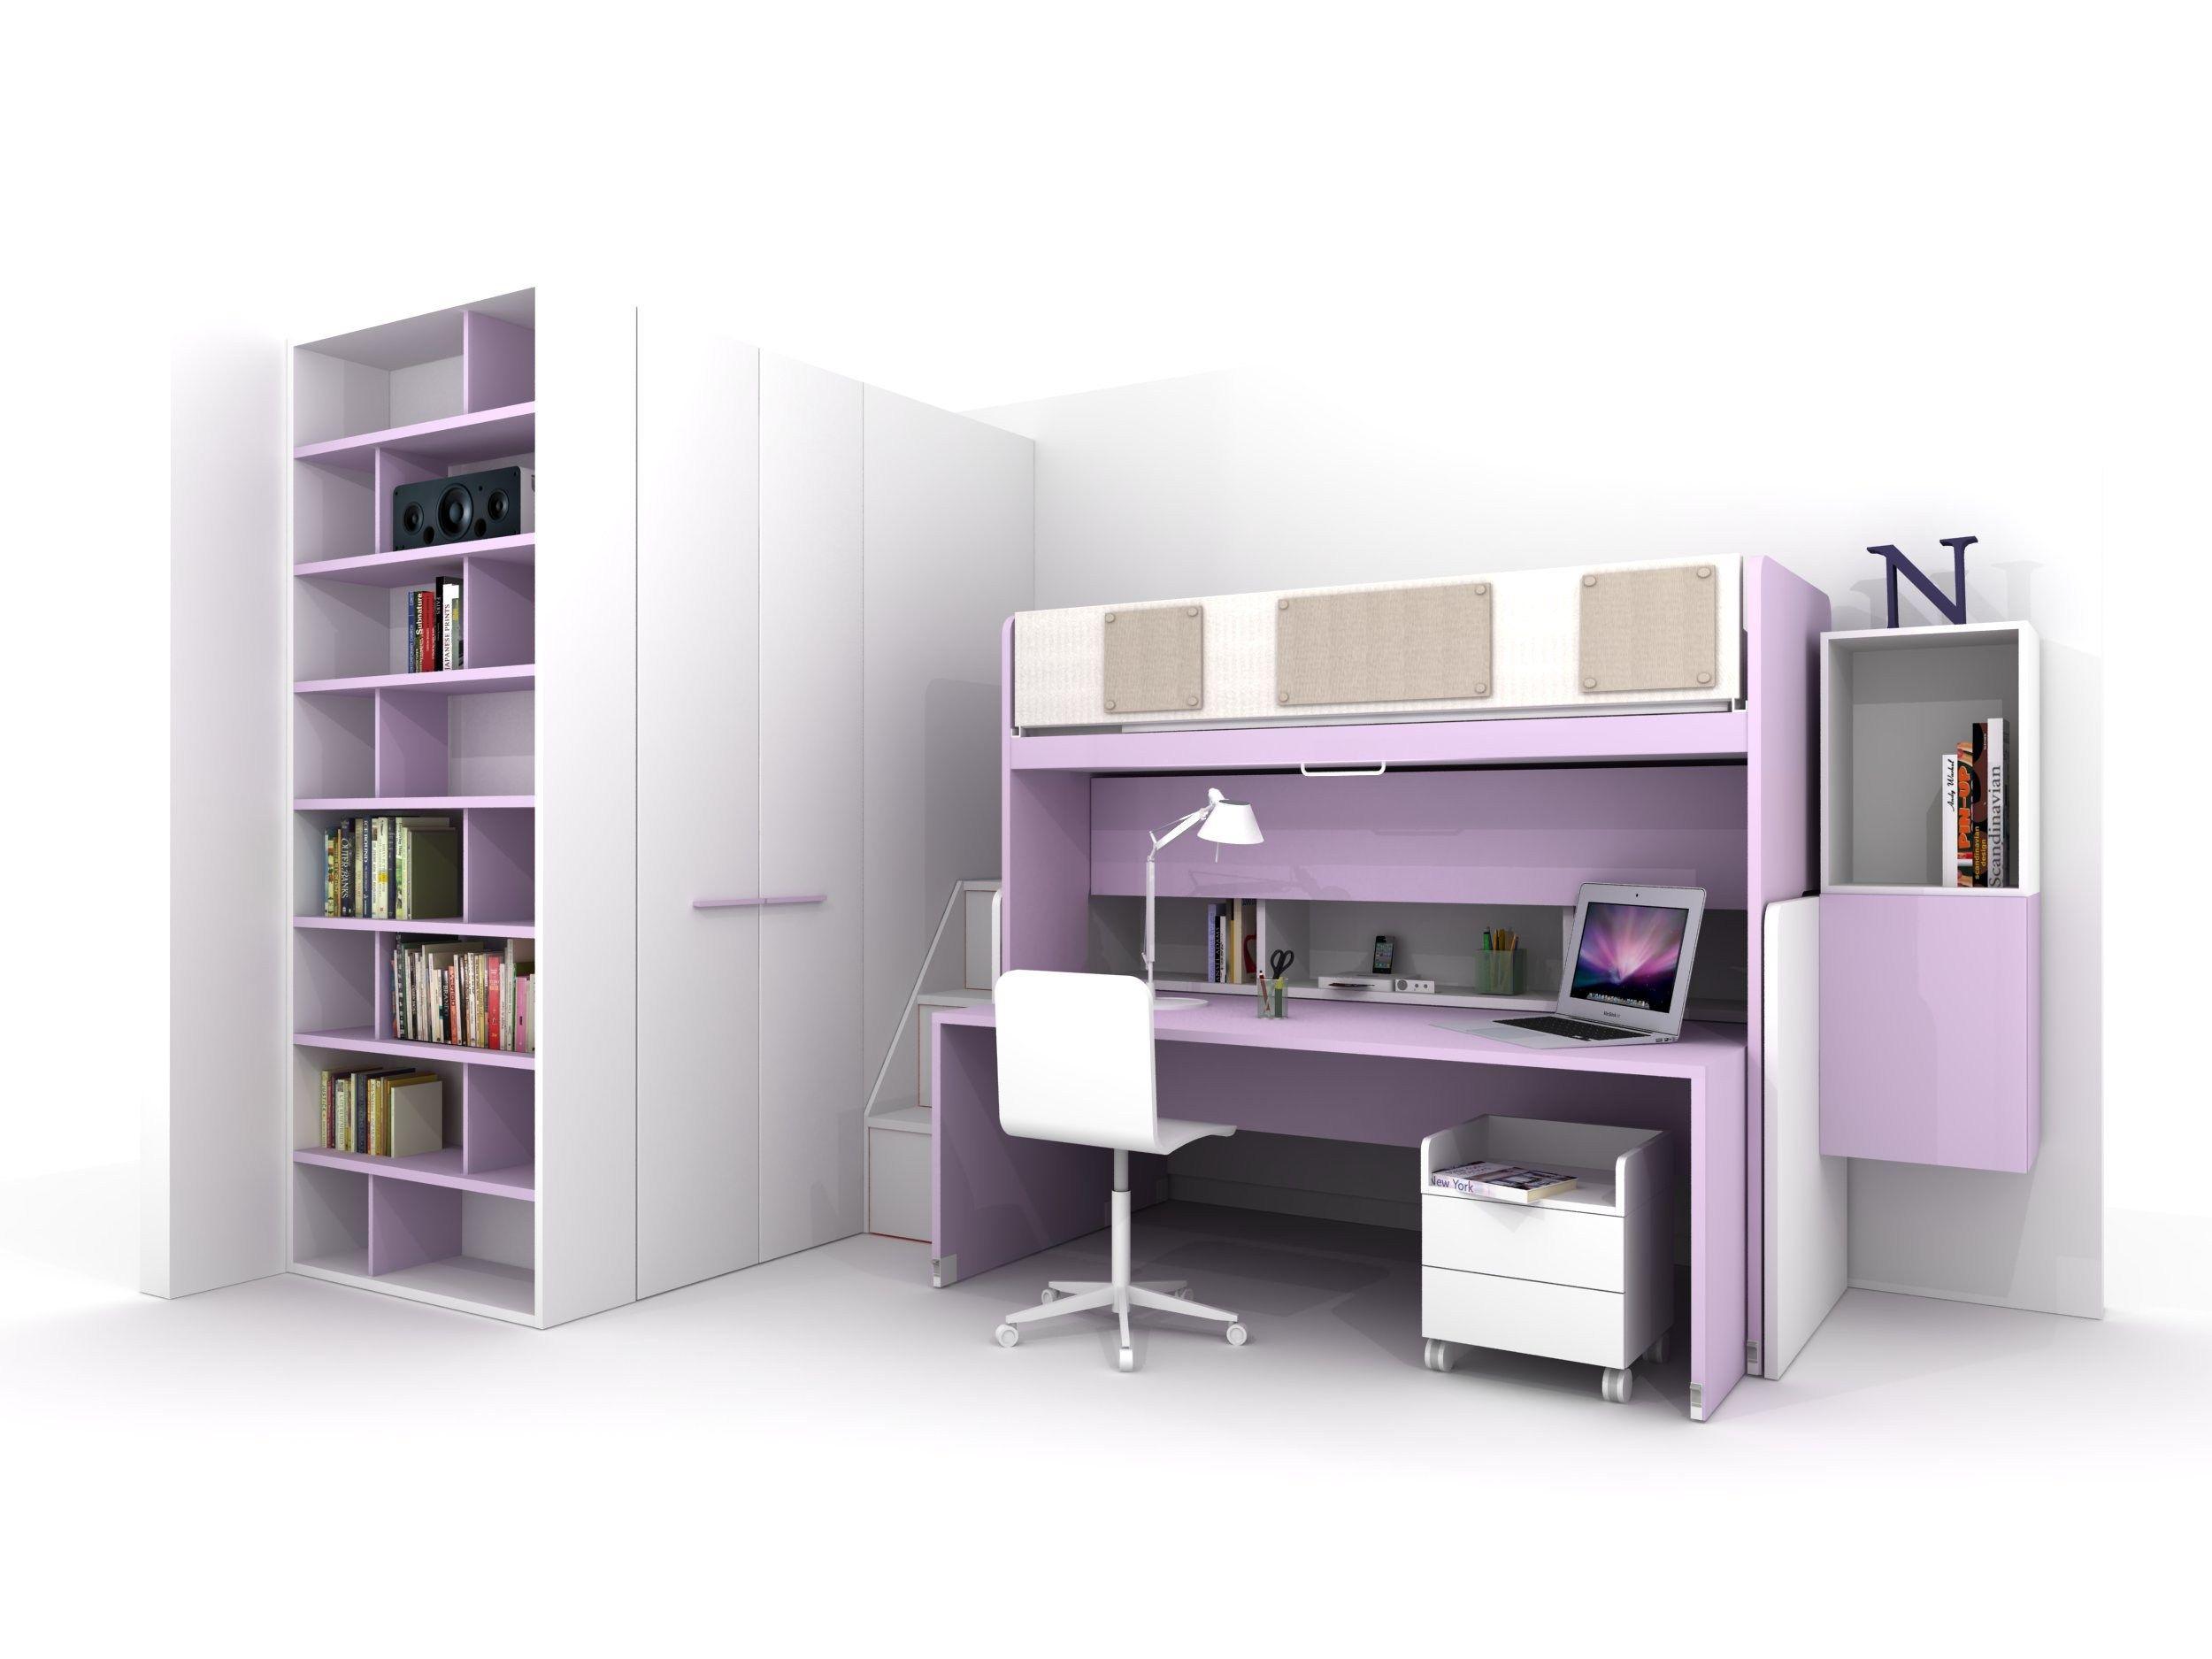 z407 cameretta by zalf. Black Bedroom Furniture Sets. Home Design Ideas